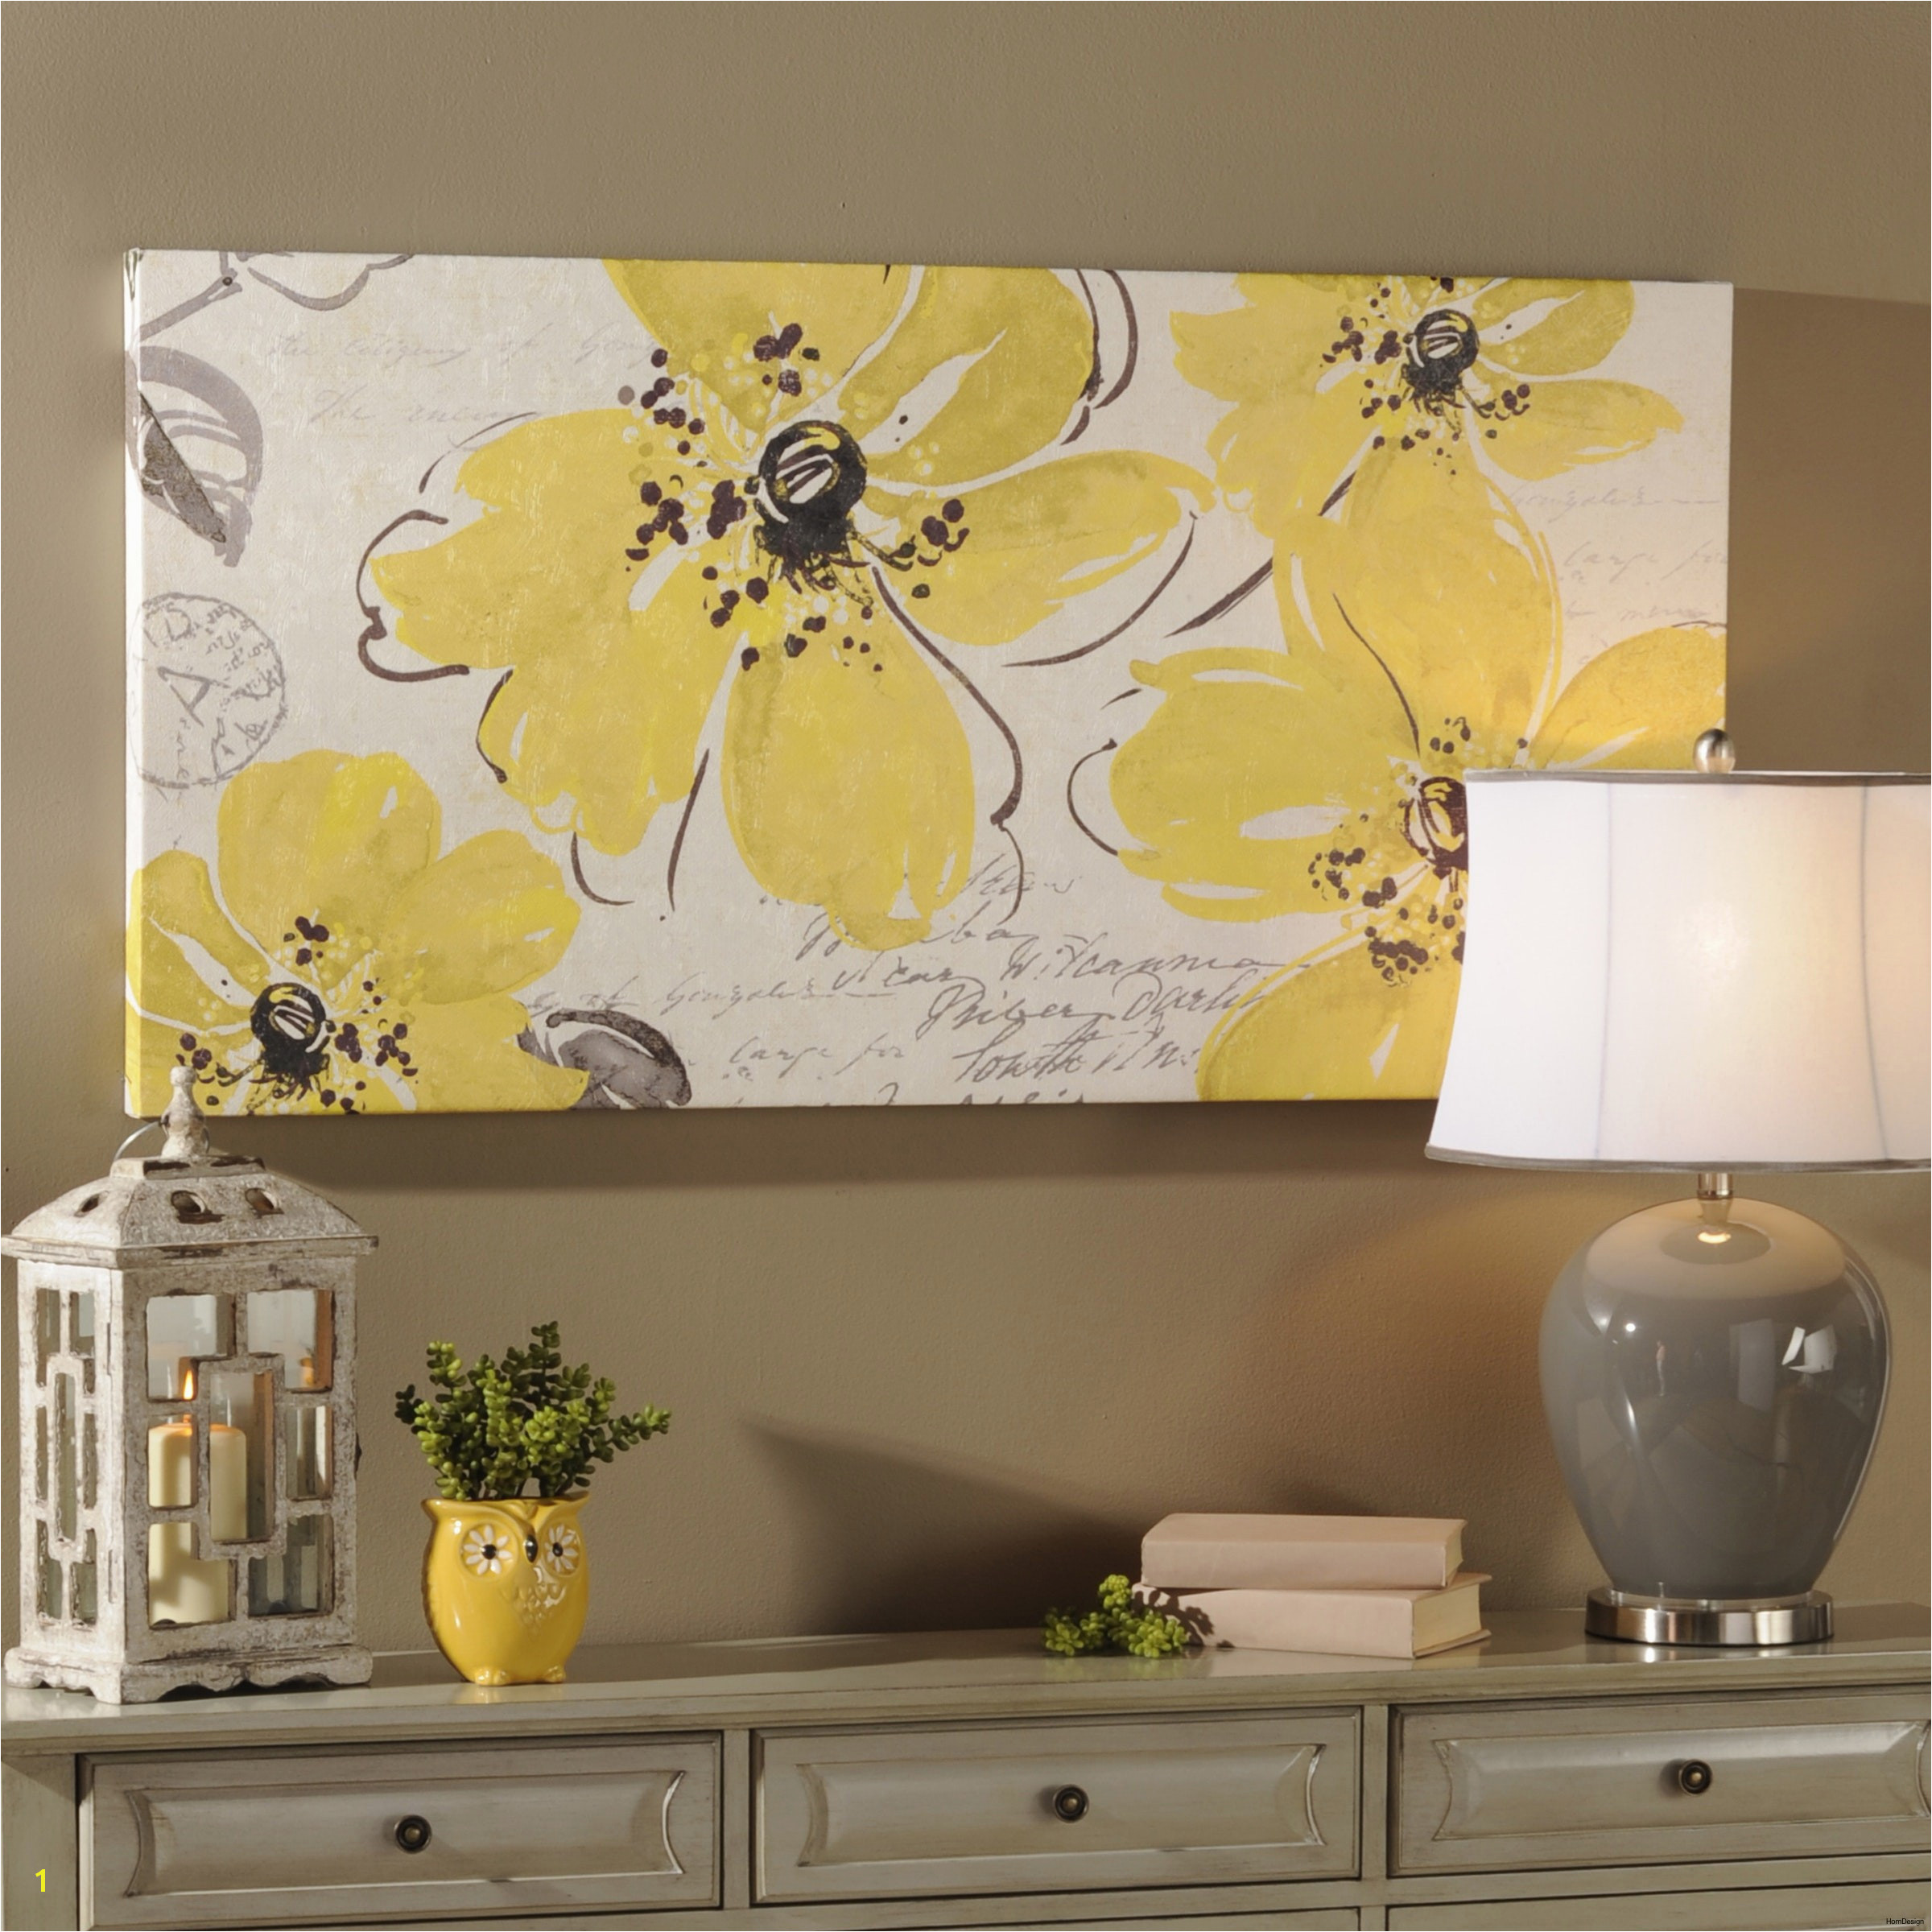 Wall Decals For Bedroom Unique 1 Kirkland Wall Decor Home Design 0d 2019 Floral Wallpaper Designs For Living Room